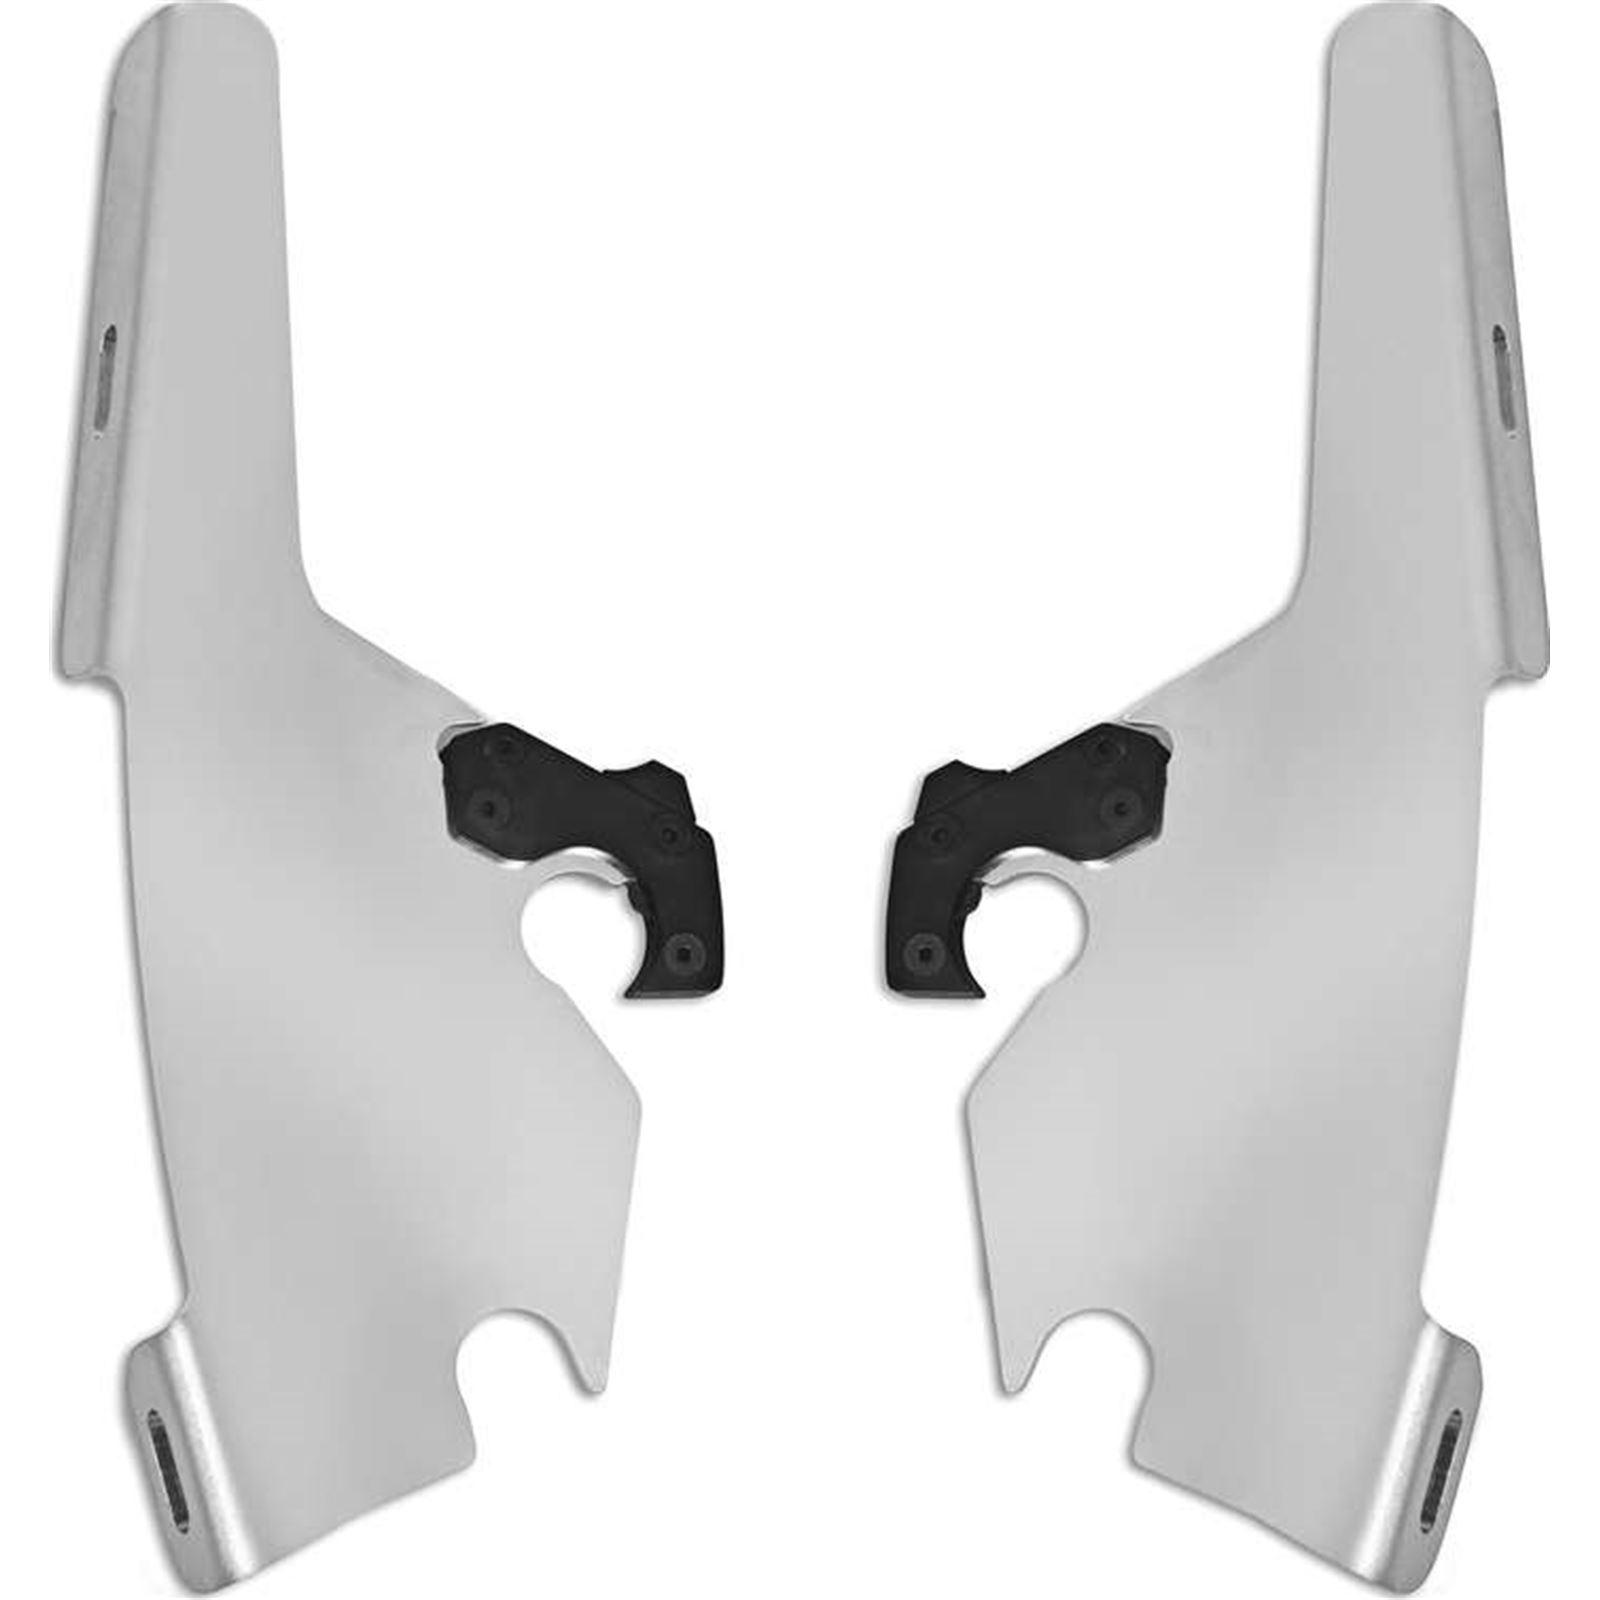 Memphis Shades Batwing Plate Kit - Polished - FLSB